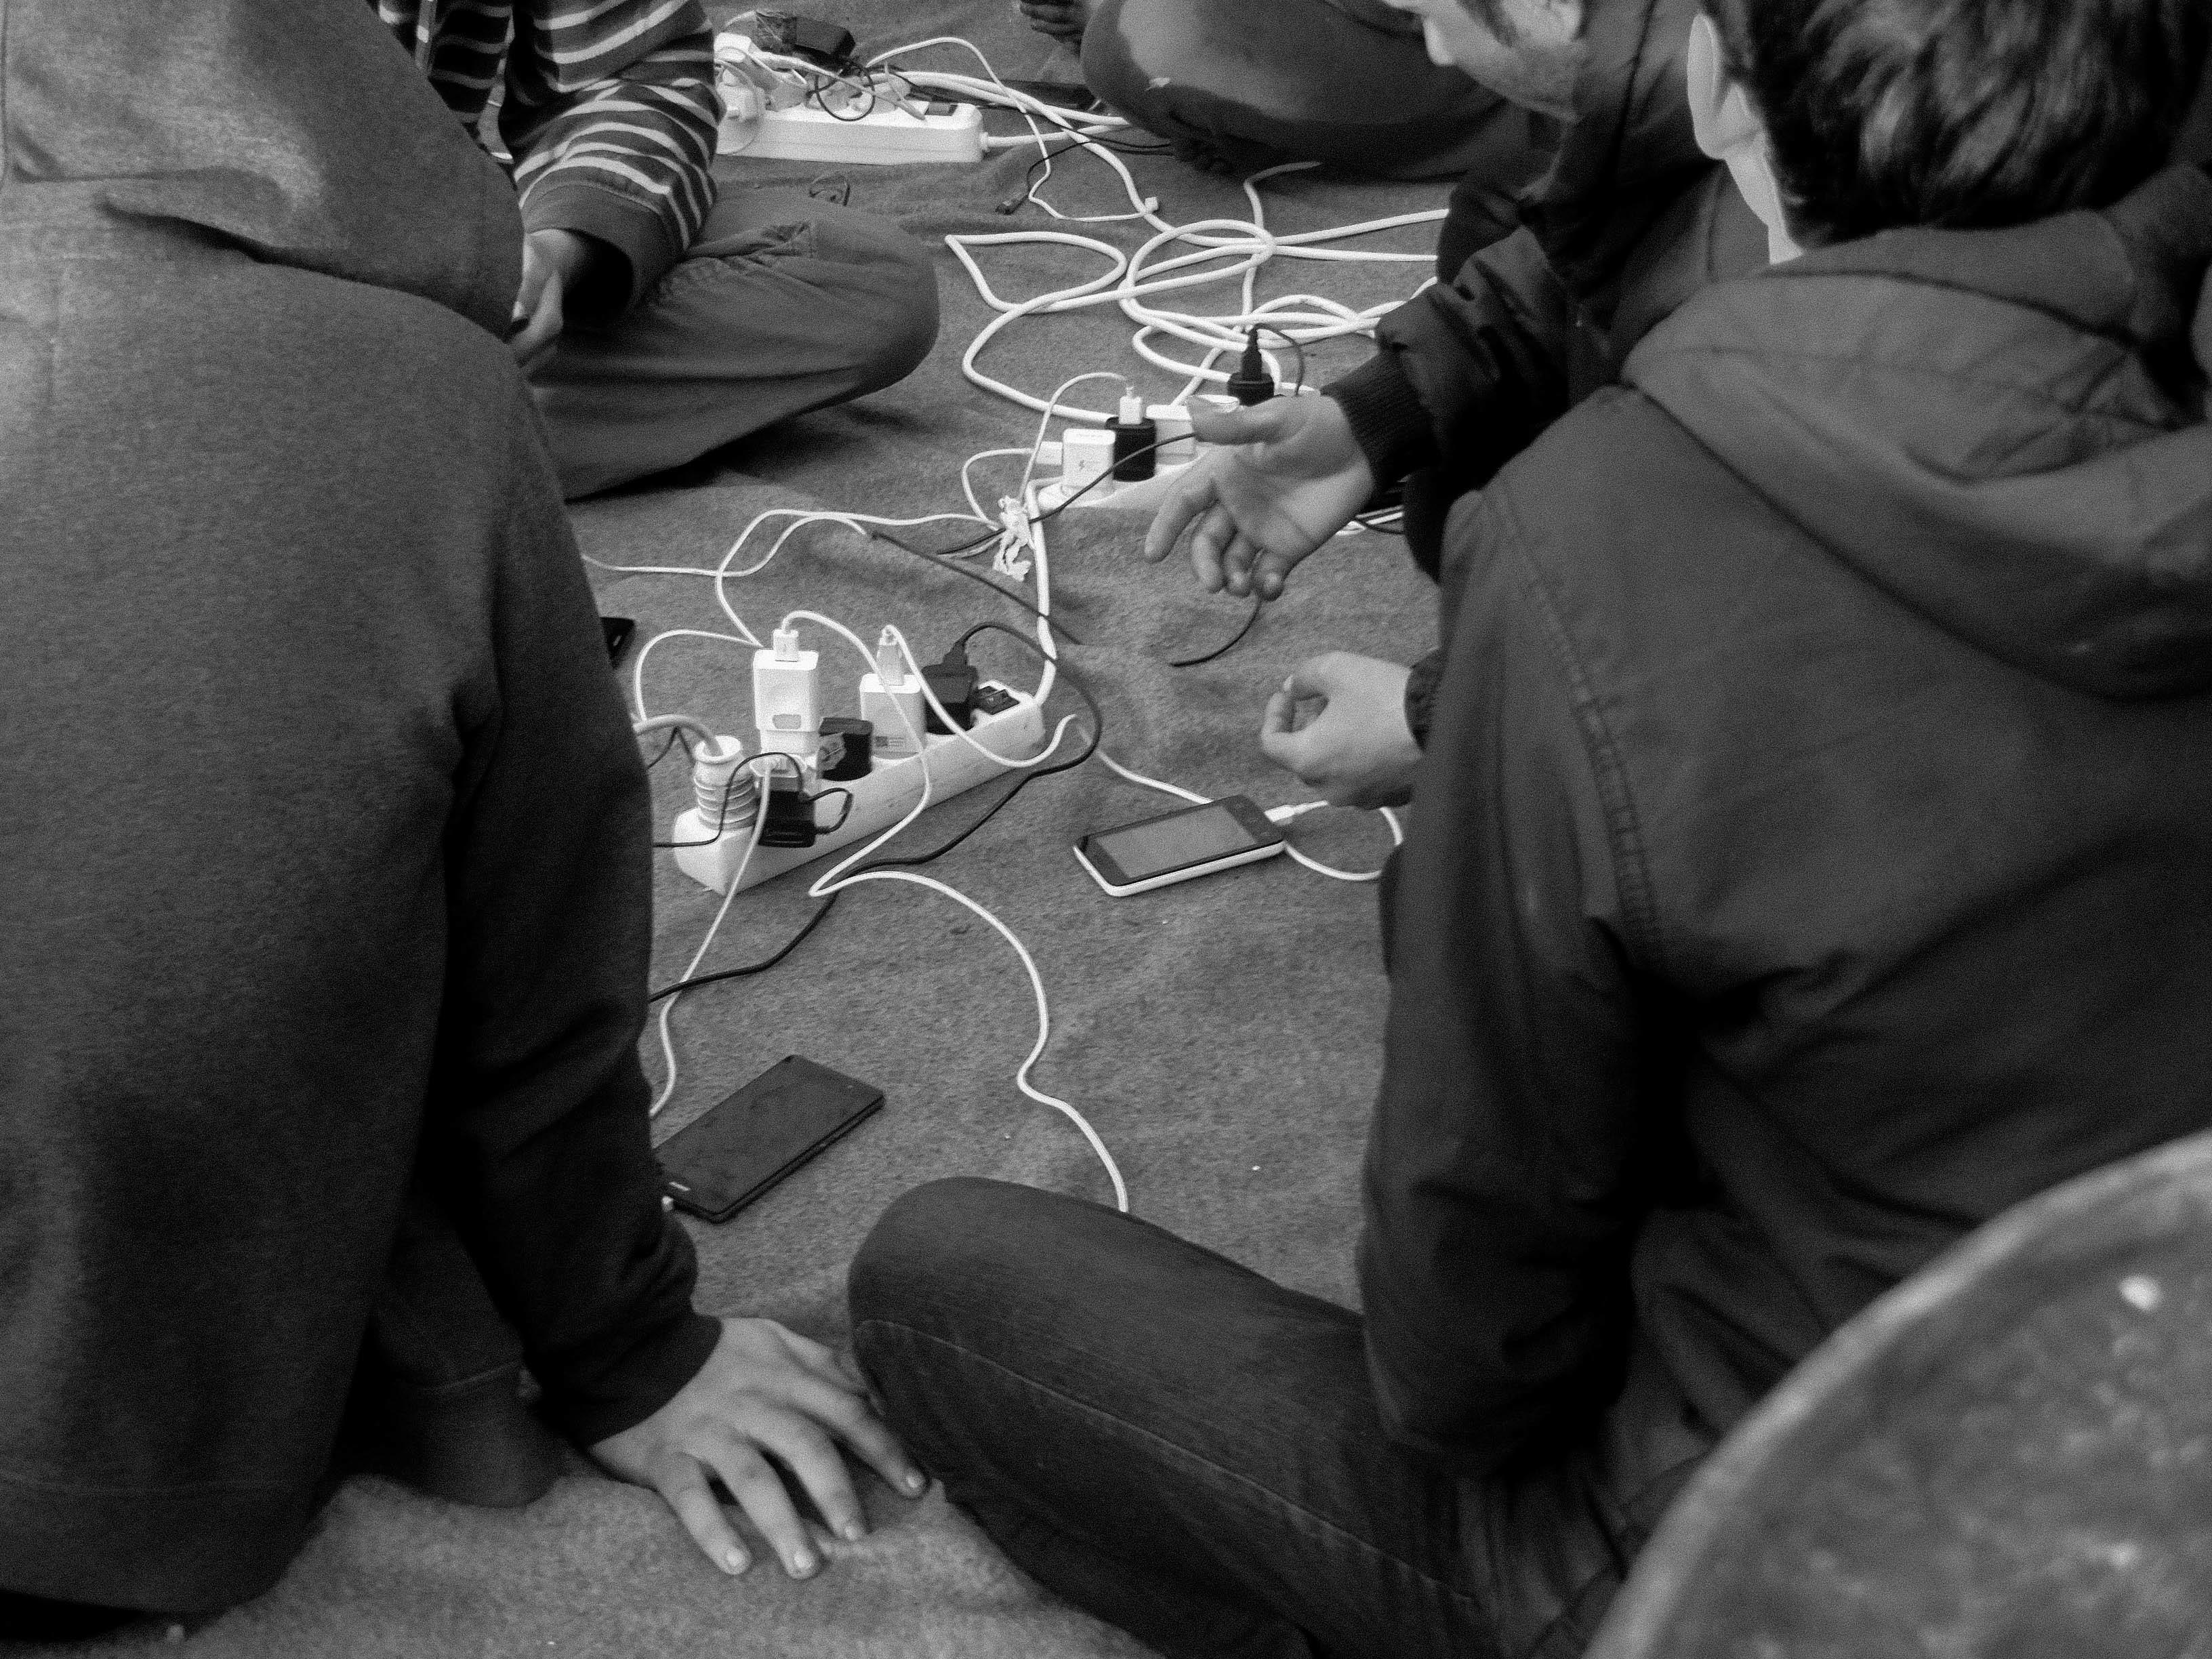 Charging Phones - Serbian Refugees